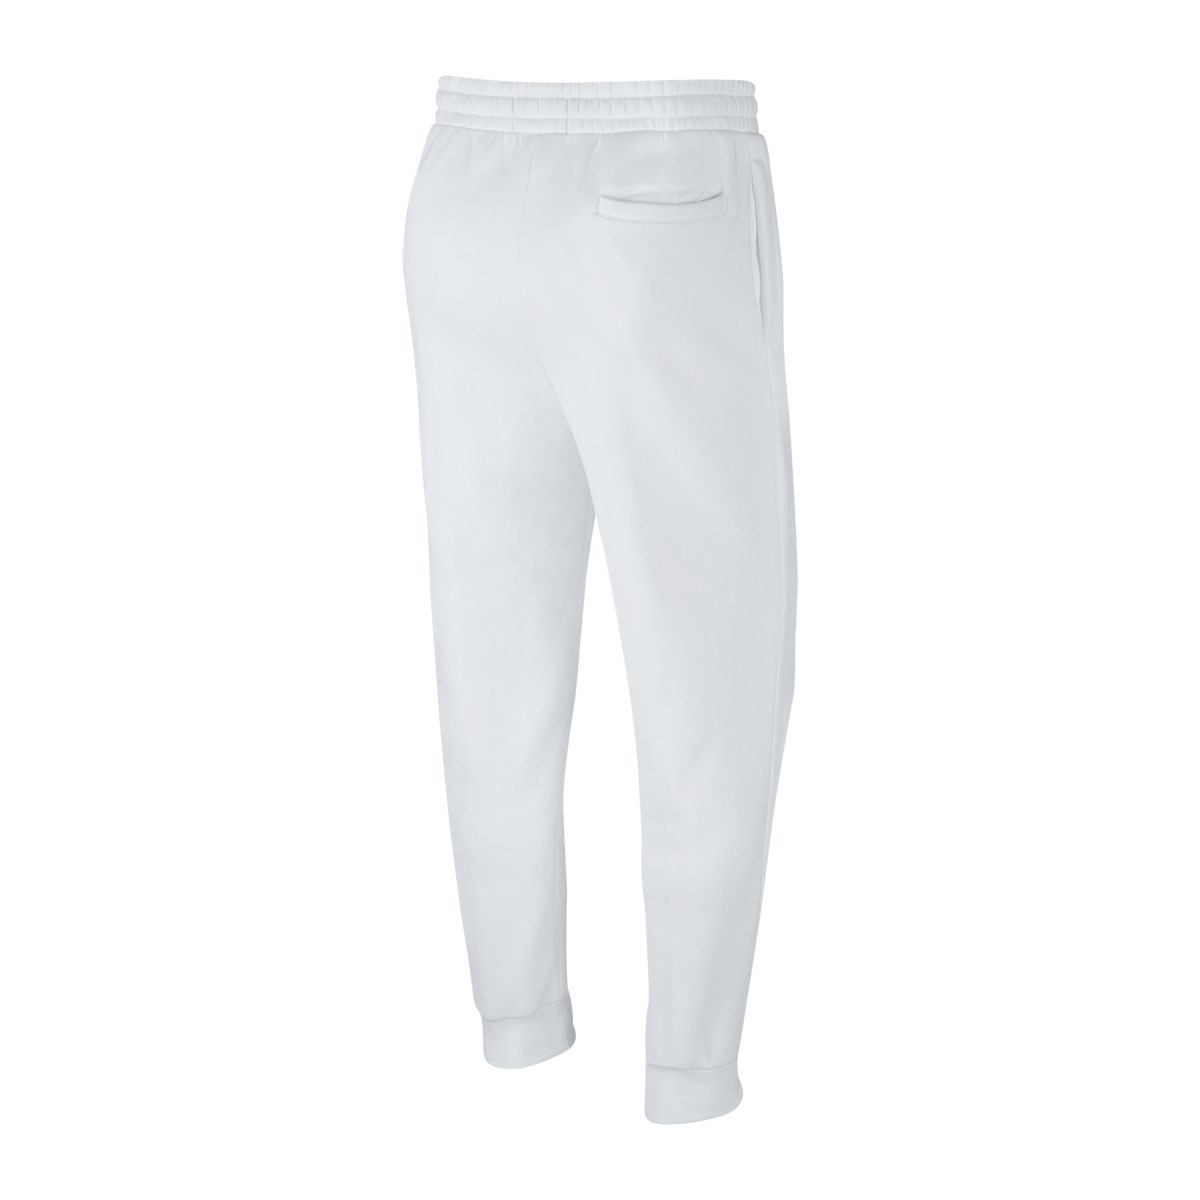 0dddb0fc8bf441 NIKE JUMPMAN AIR GFX FLEECE PANT (WHITE GYM RED) (Nike Jordan jump man air  GFX fleece underwear)